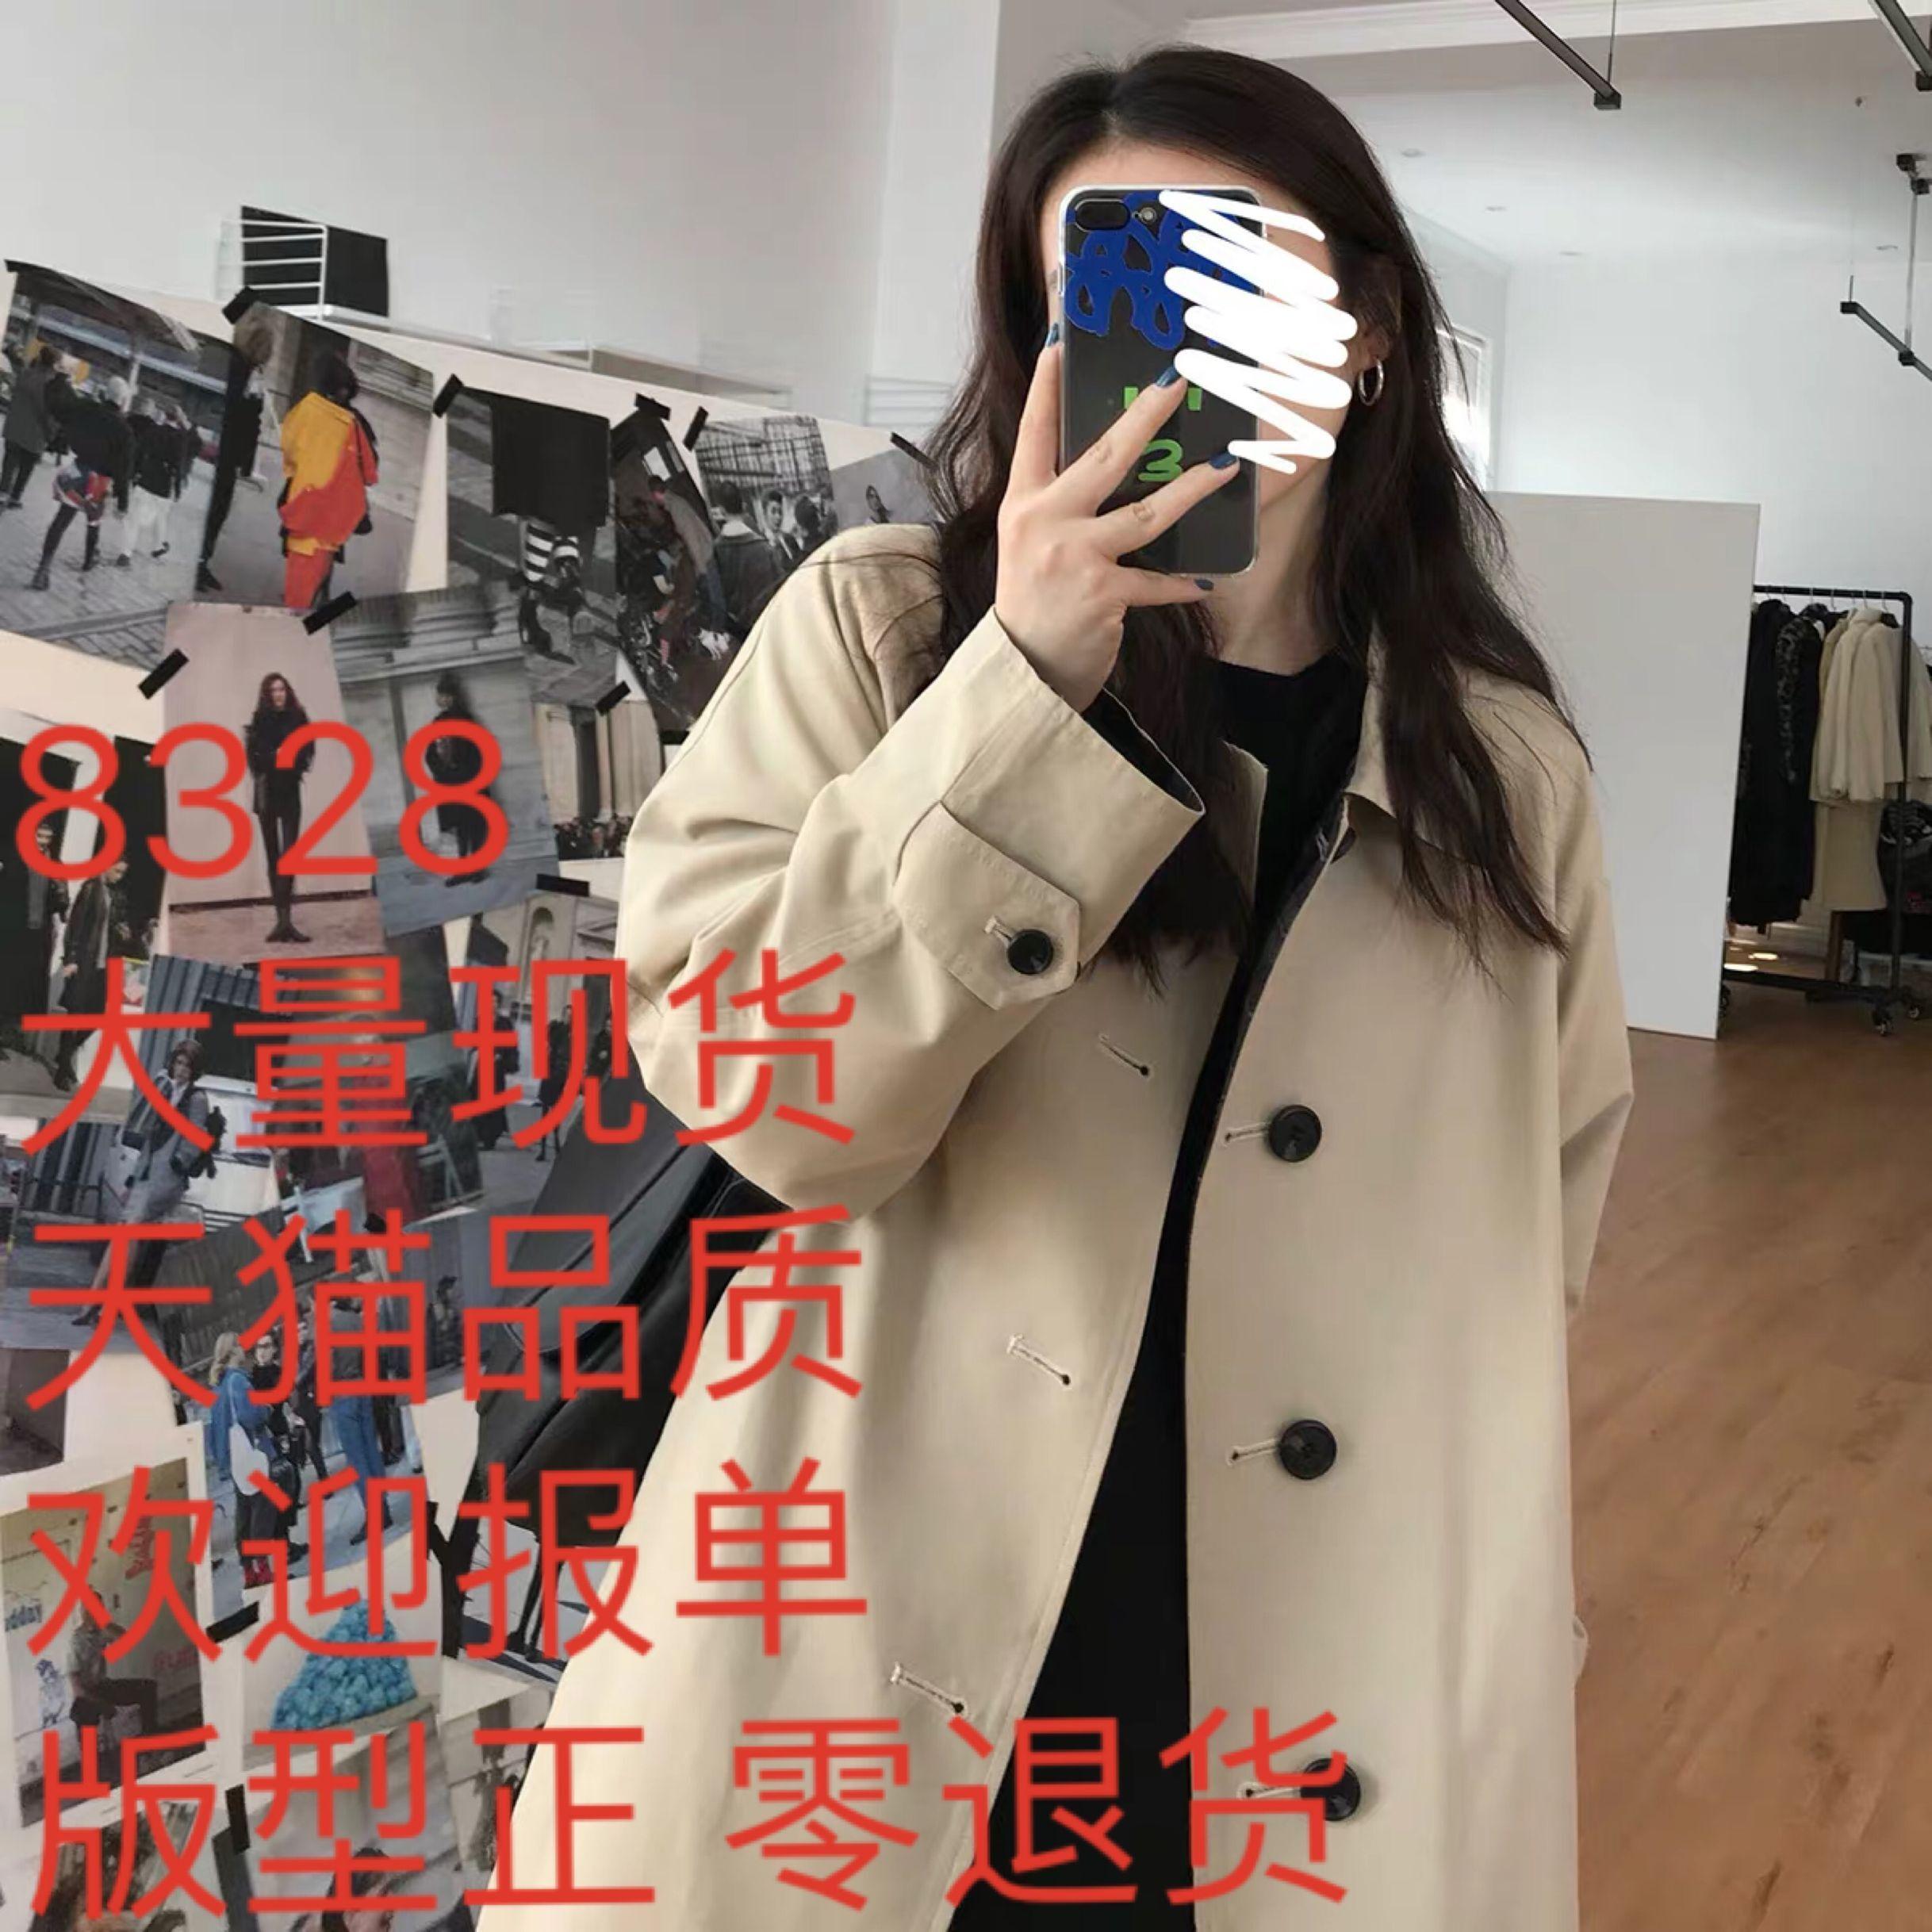 SUNNYDAND自制19秋/2面穿巧克力格紋色系單排扣風衣 等跑單